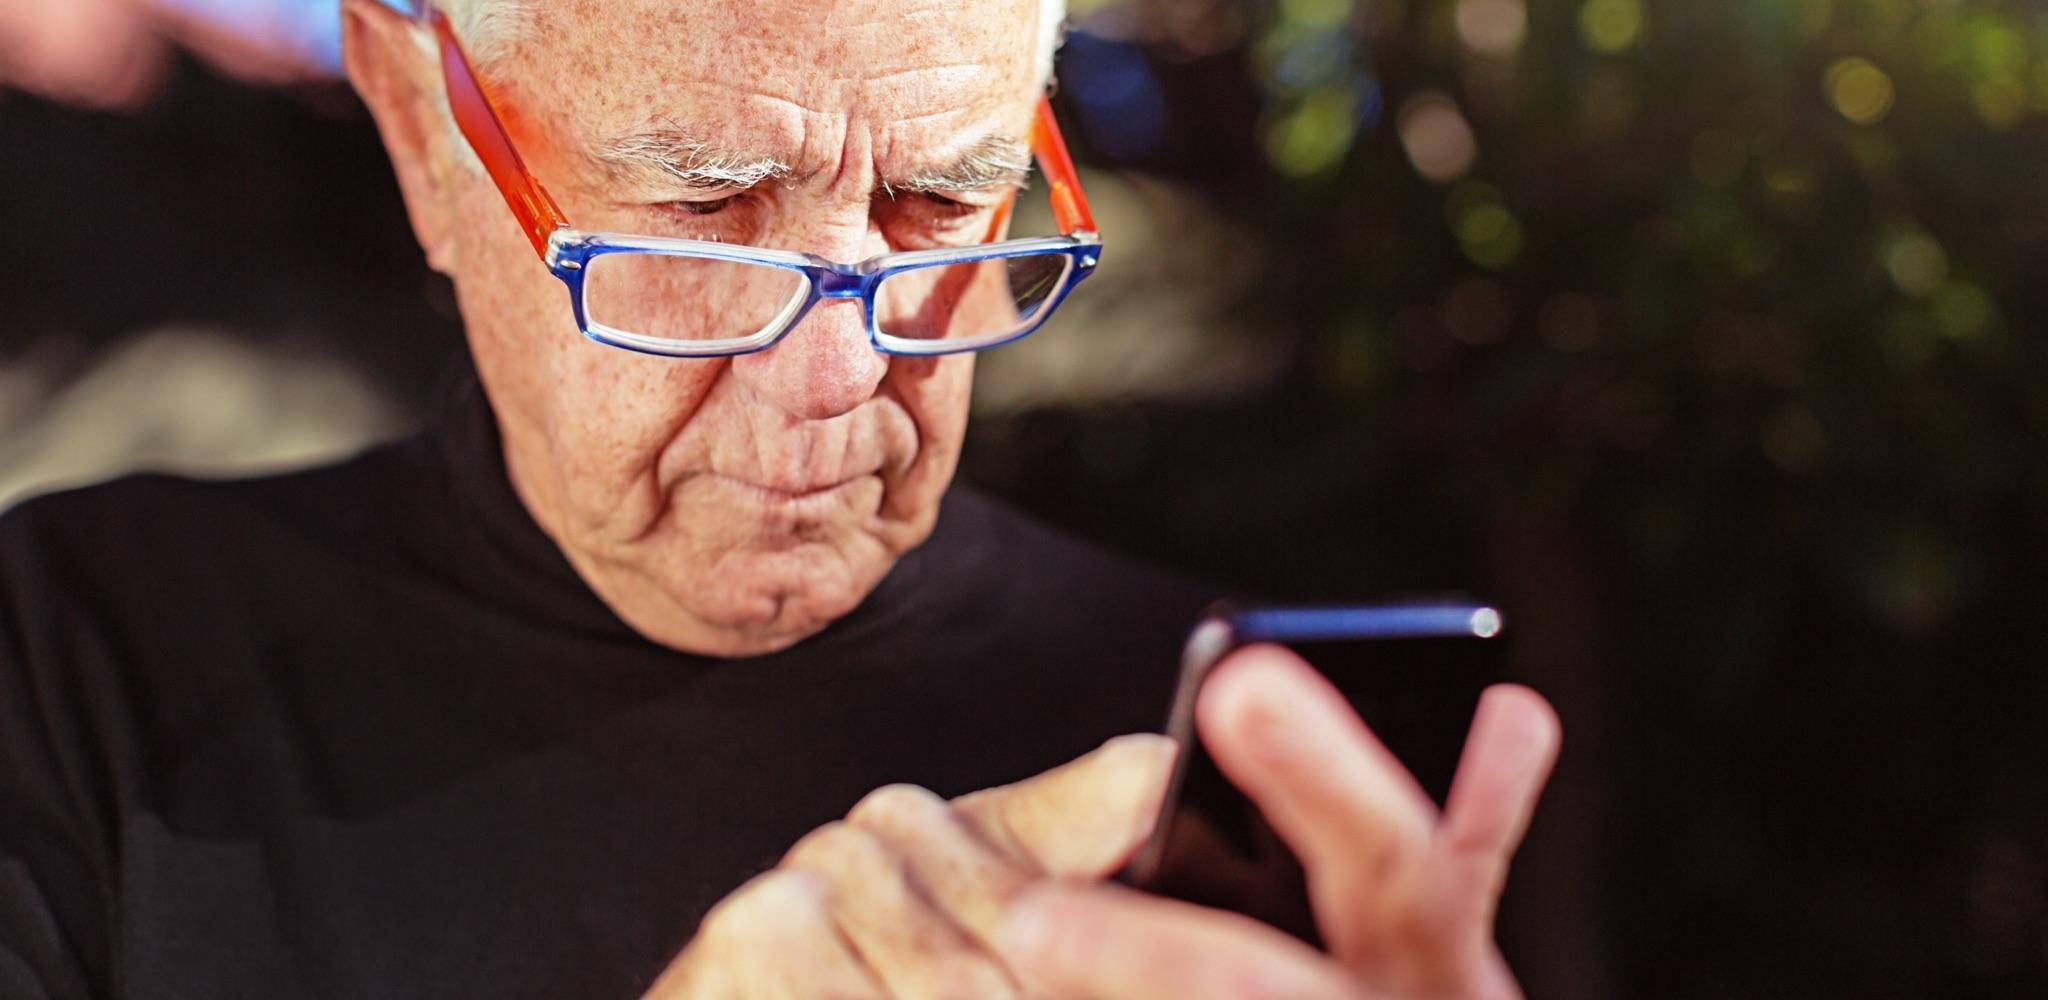 Senior man squinting over rim of glasses at phone.